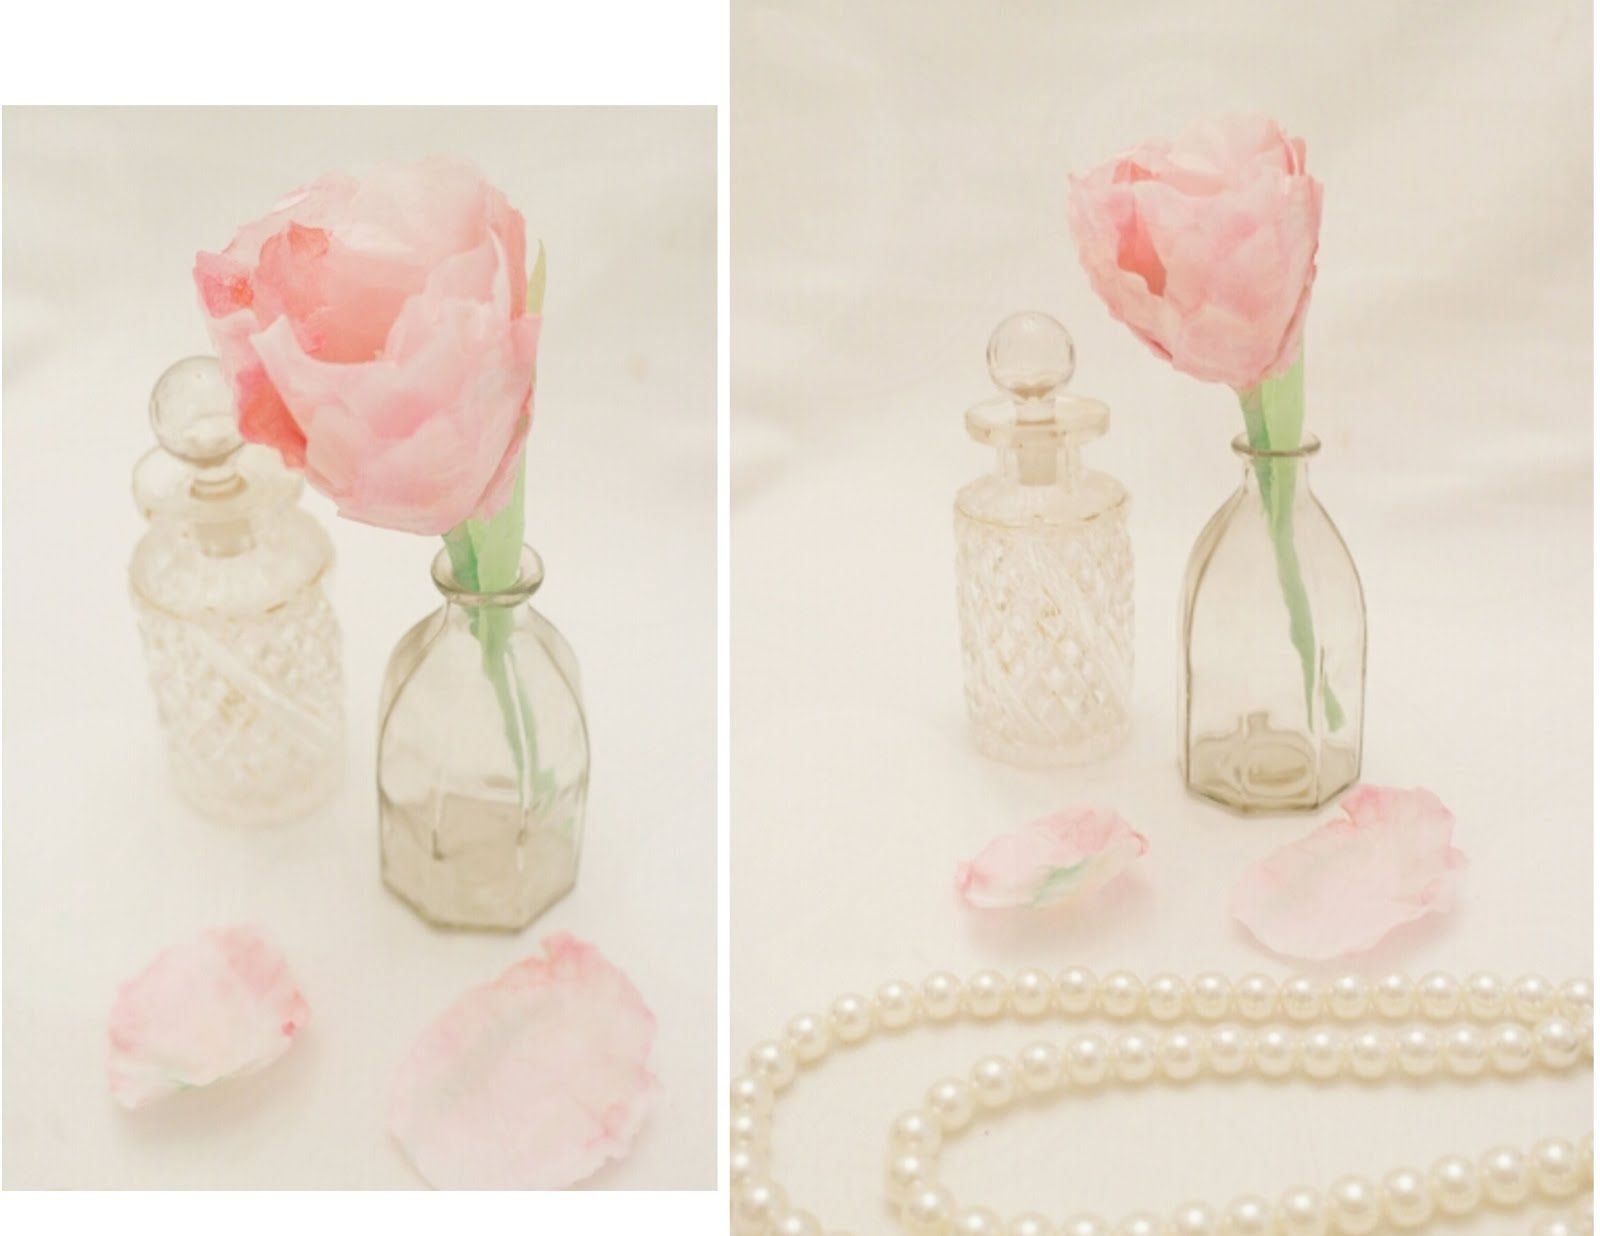 Tissue paper tulip tutorial  fabric and fake flowers  Pinterest